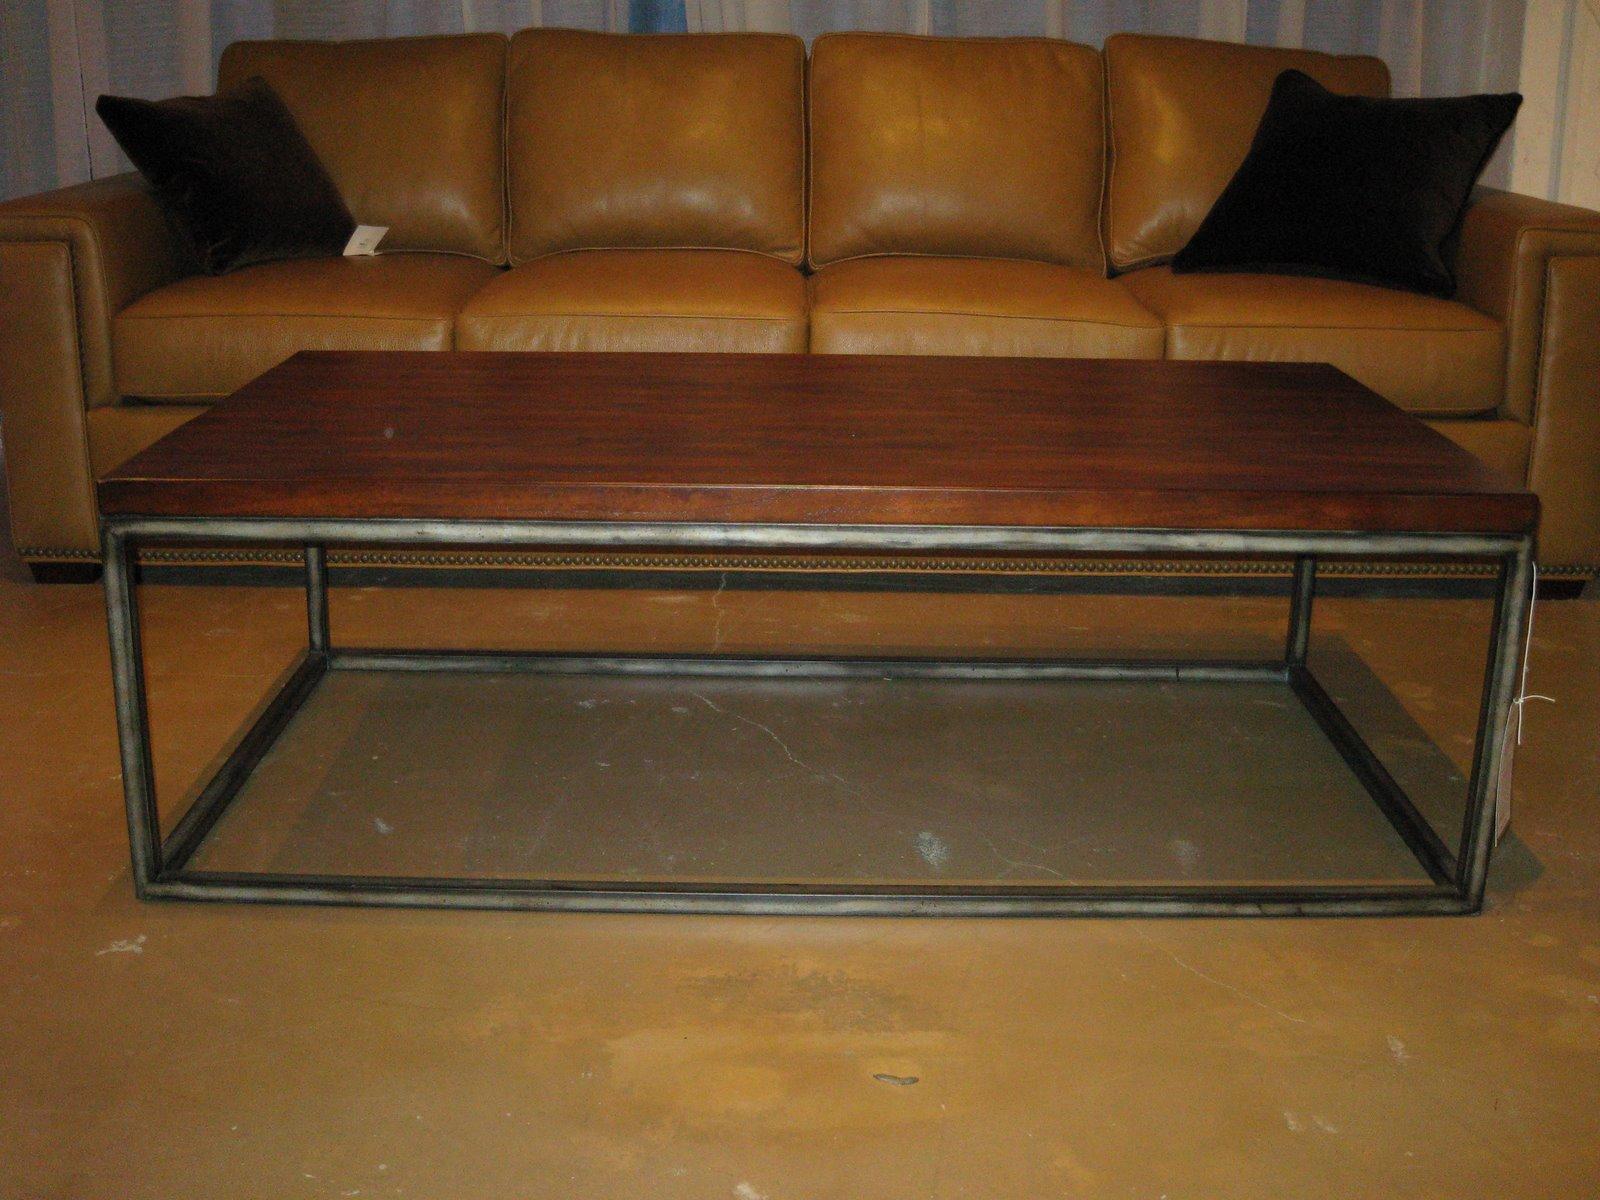 west elm bridge coffee table